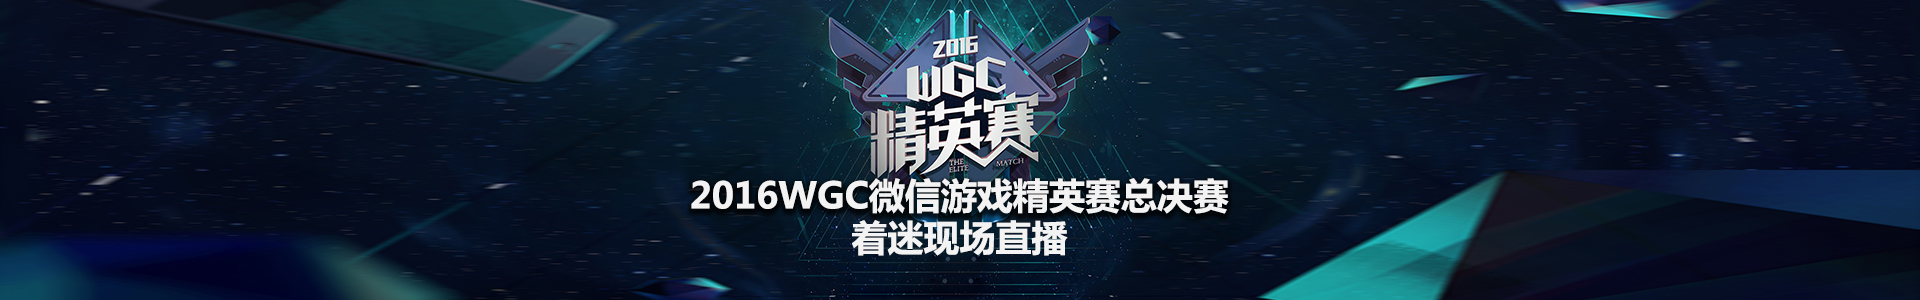 2016WGC微信游戏精英赛总决赛 着迷现场直播